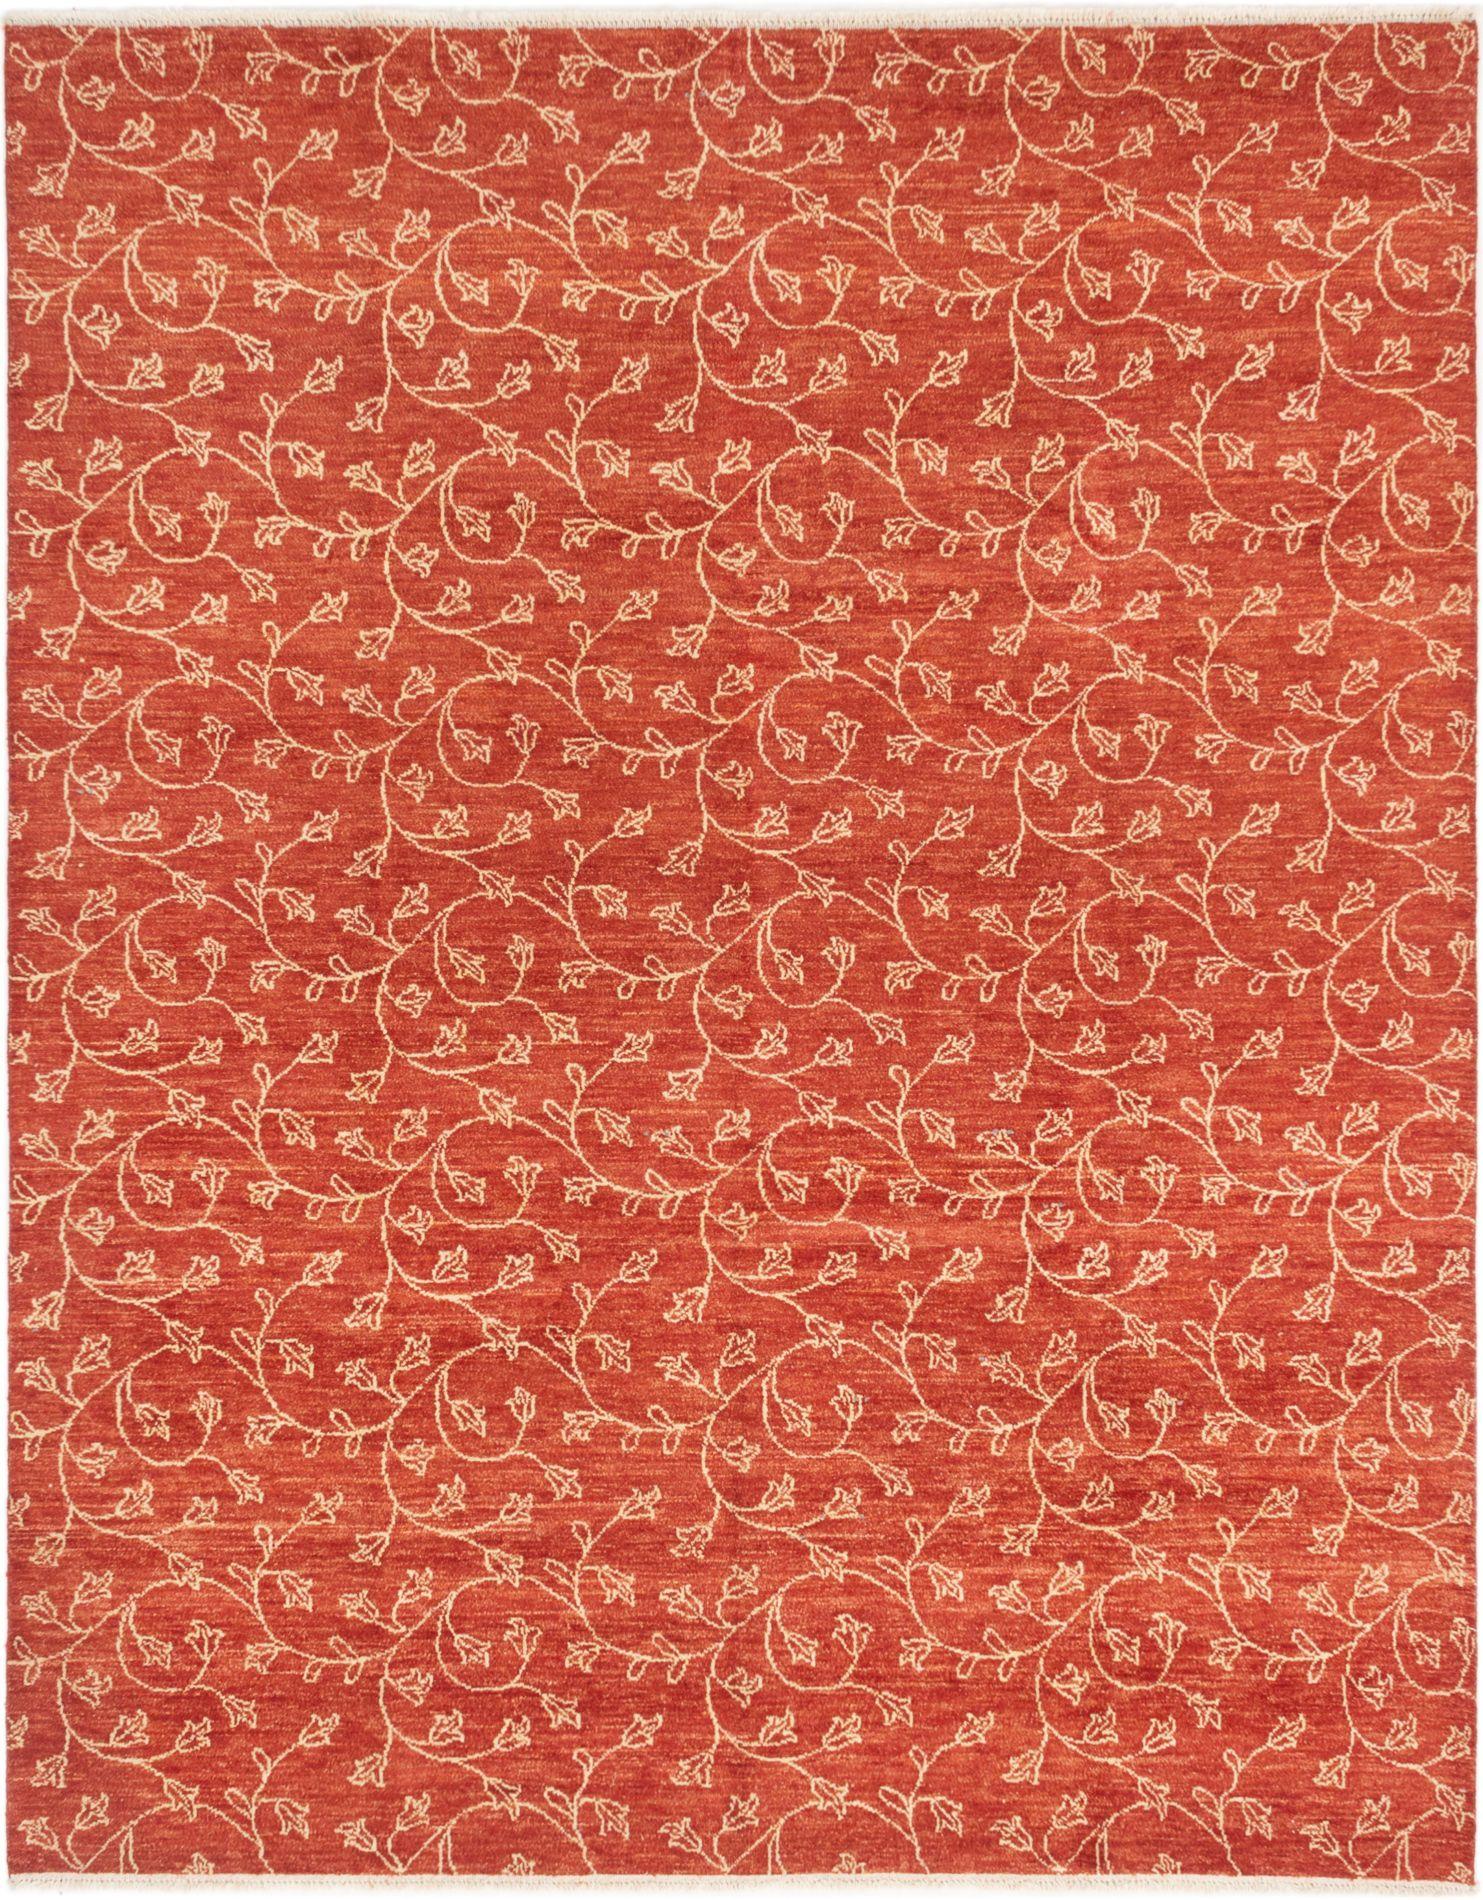 "Hand-knotted Ziegler Chobi Dark Copper Wool Rug 7'8"" x 10'4"" Size: 7'8"" x 10'4"""